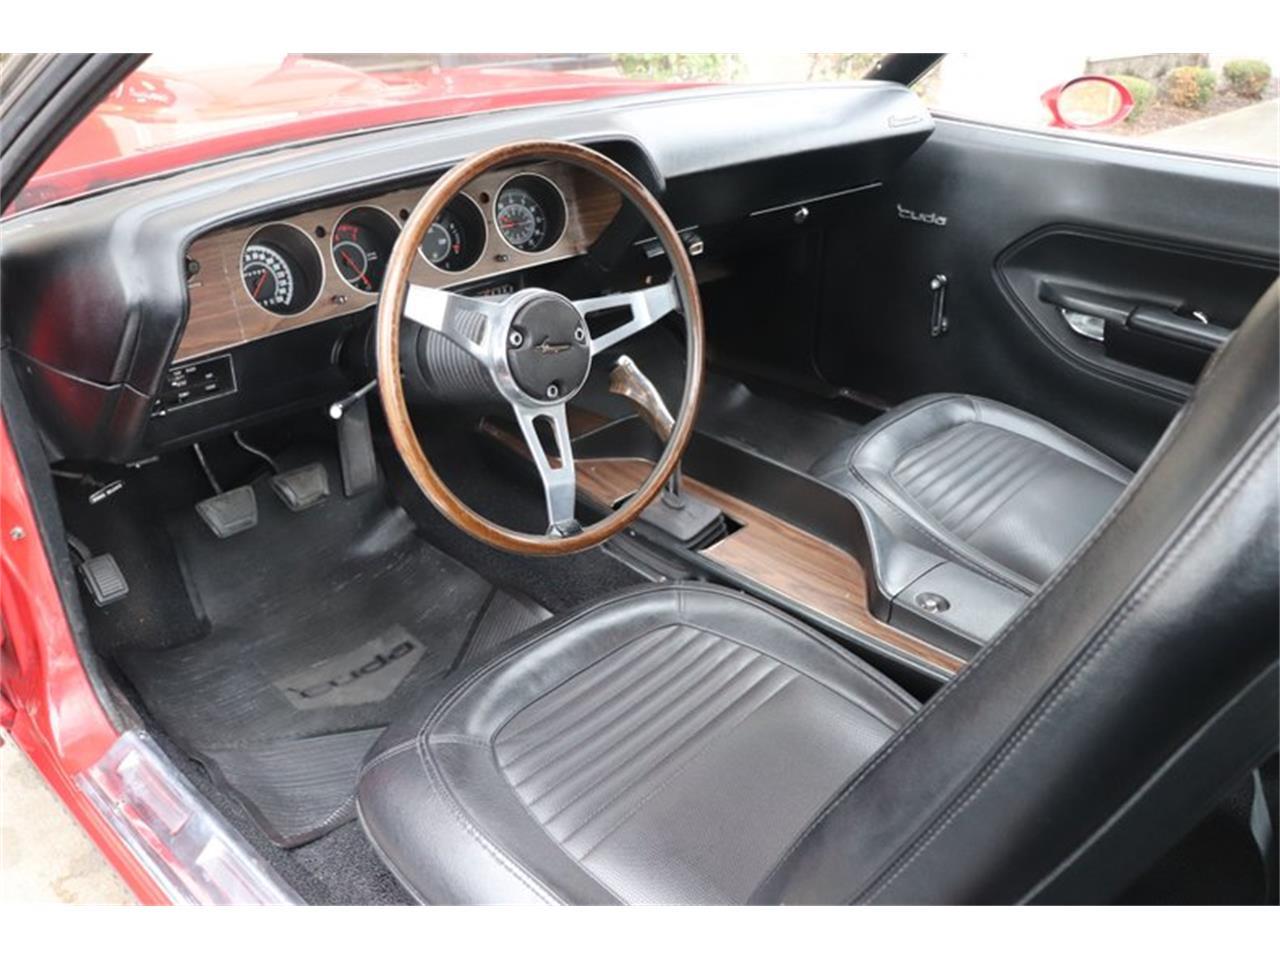 1970 Plymouth Cuda (CC-1294208) for sale in Alsip, Illinois